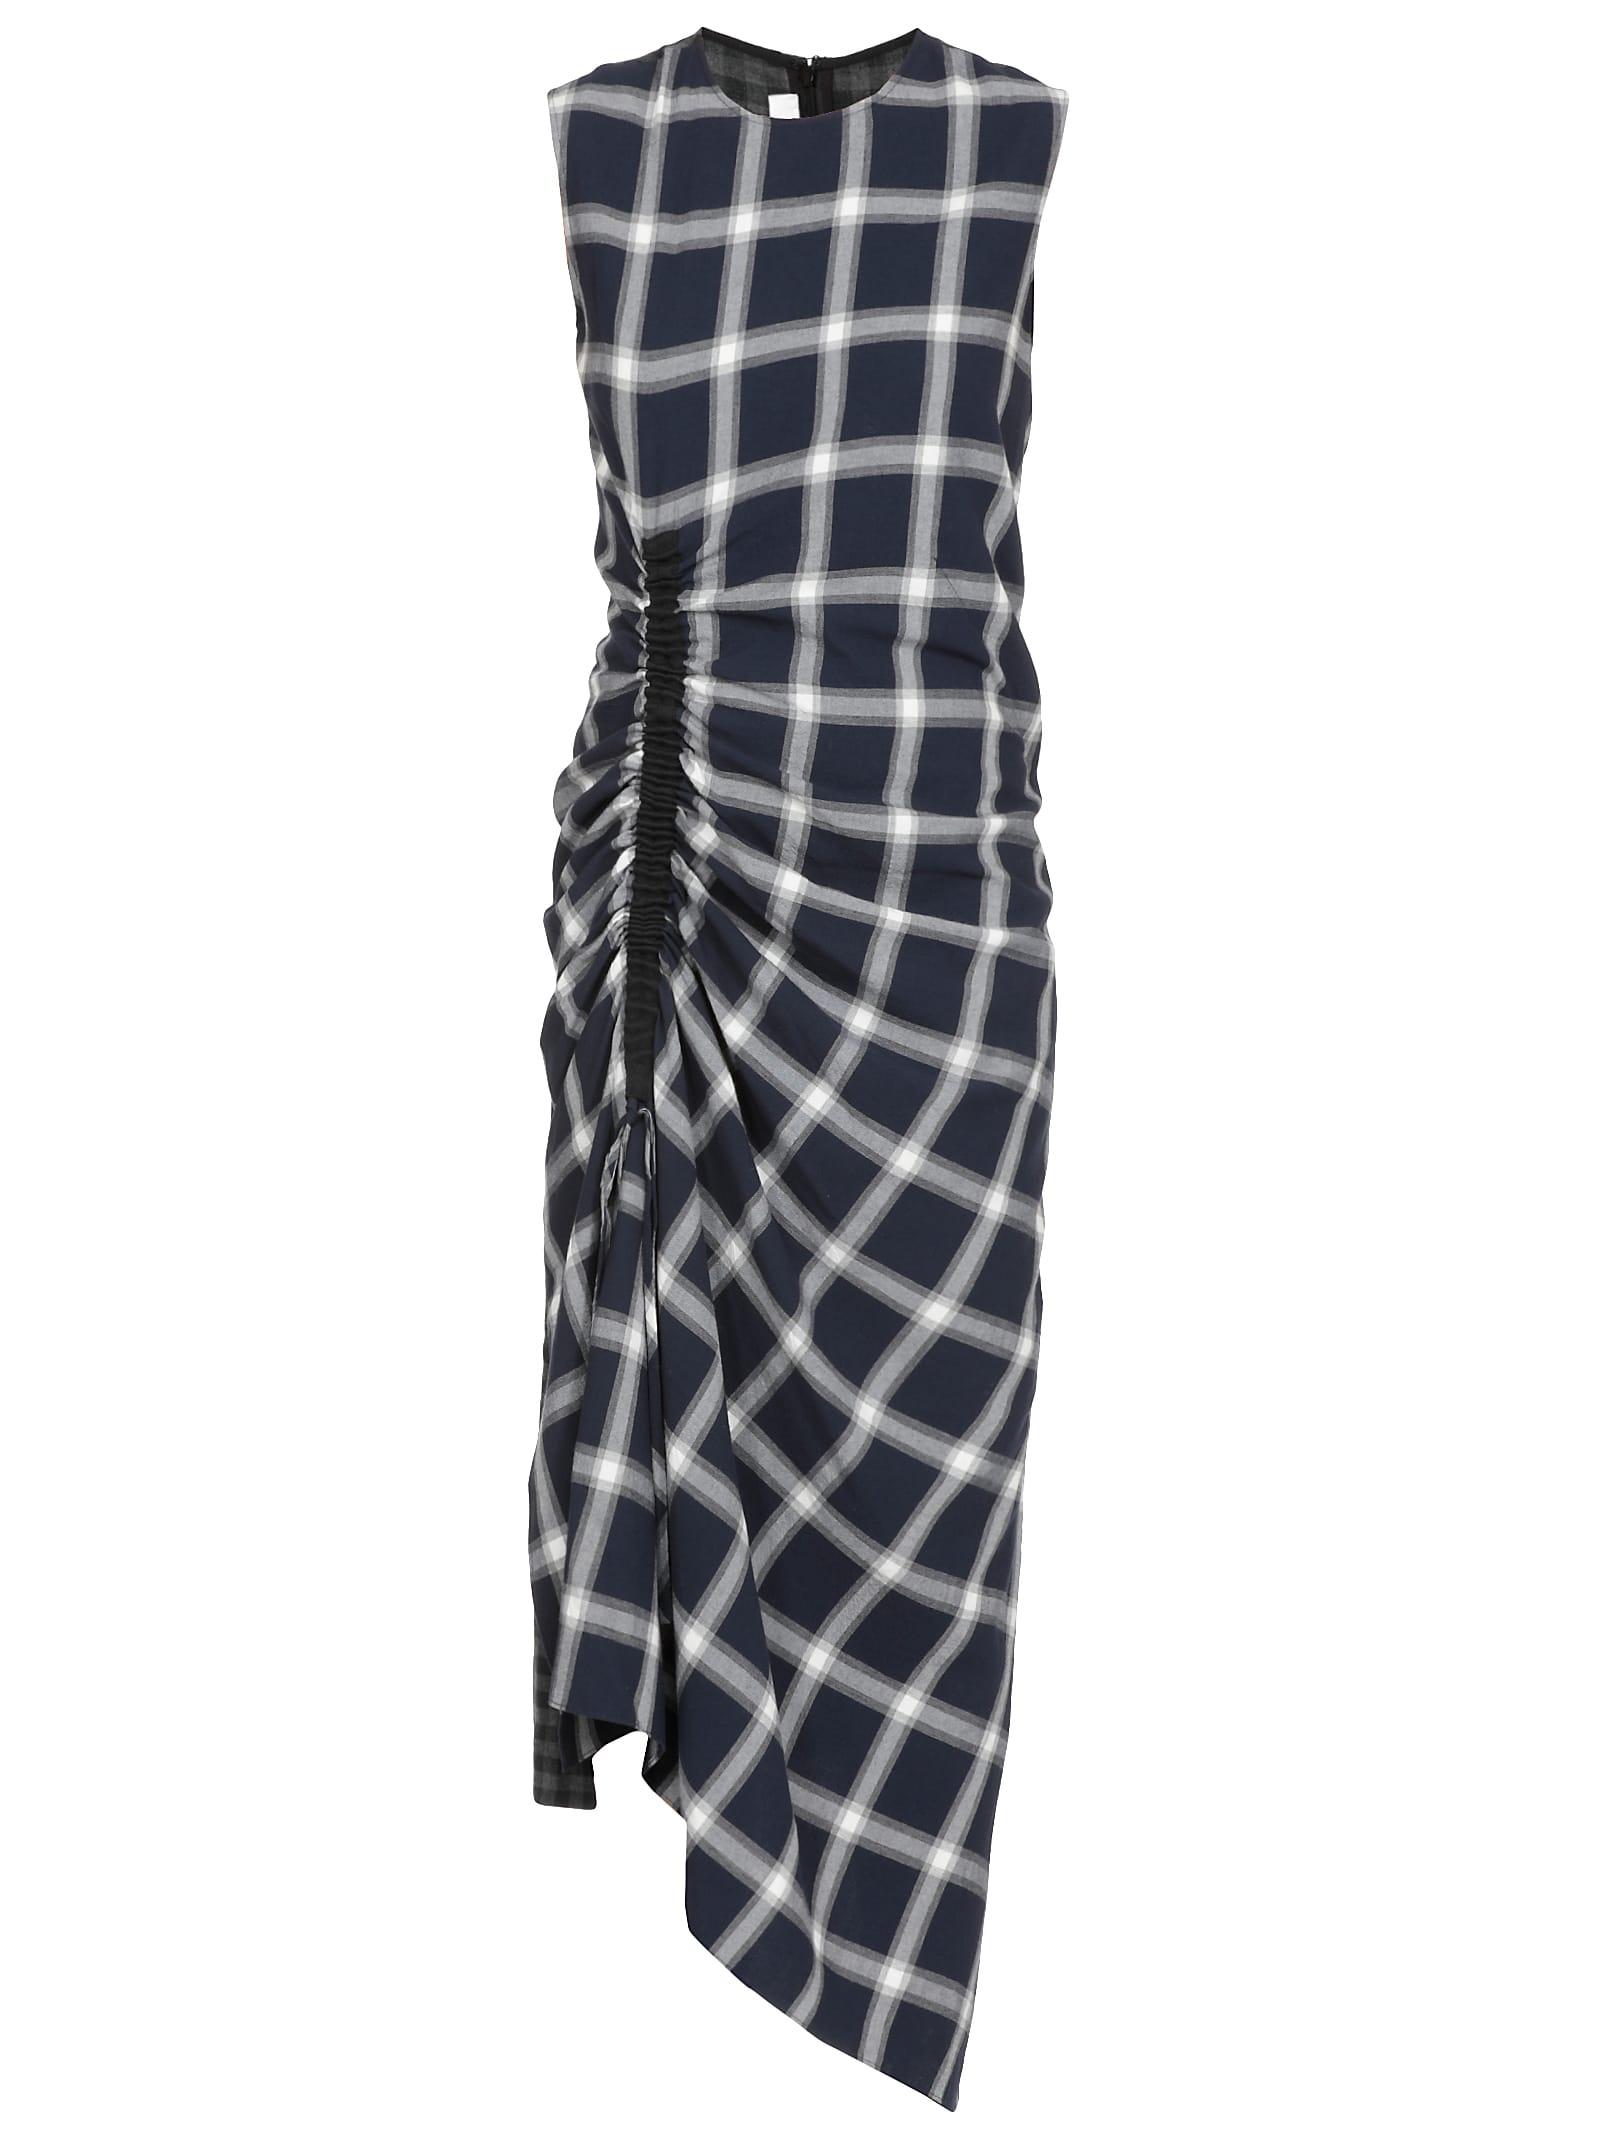 McQ Alexander McQueen Checked Dress